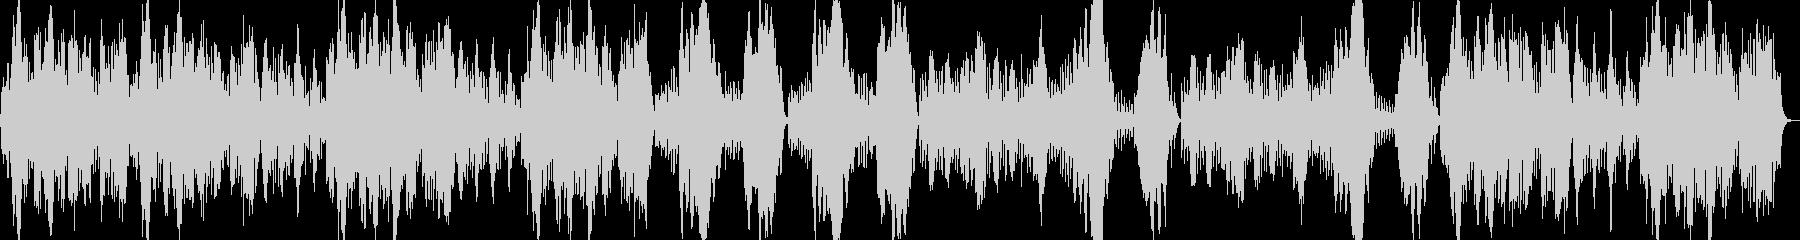 Bockelini's Menut / Bockelini's unreproduced waveform